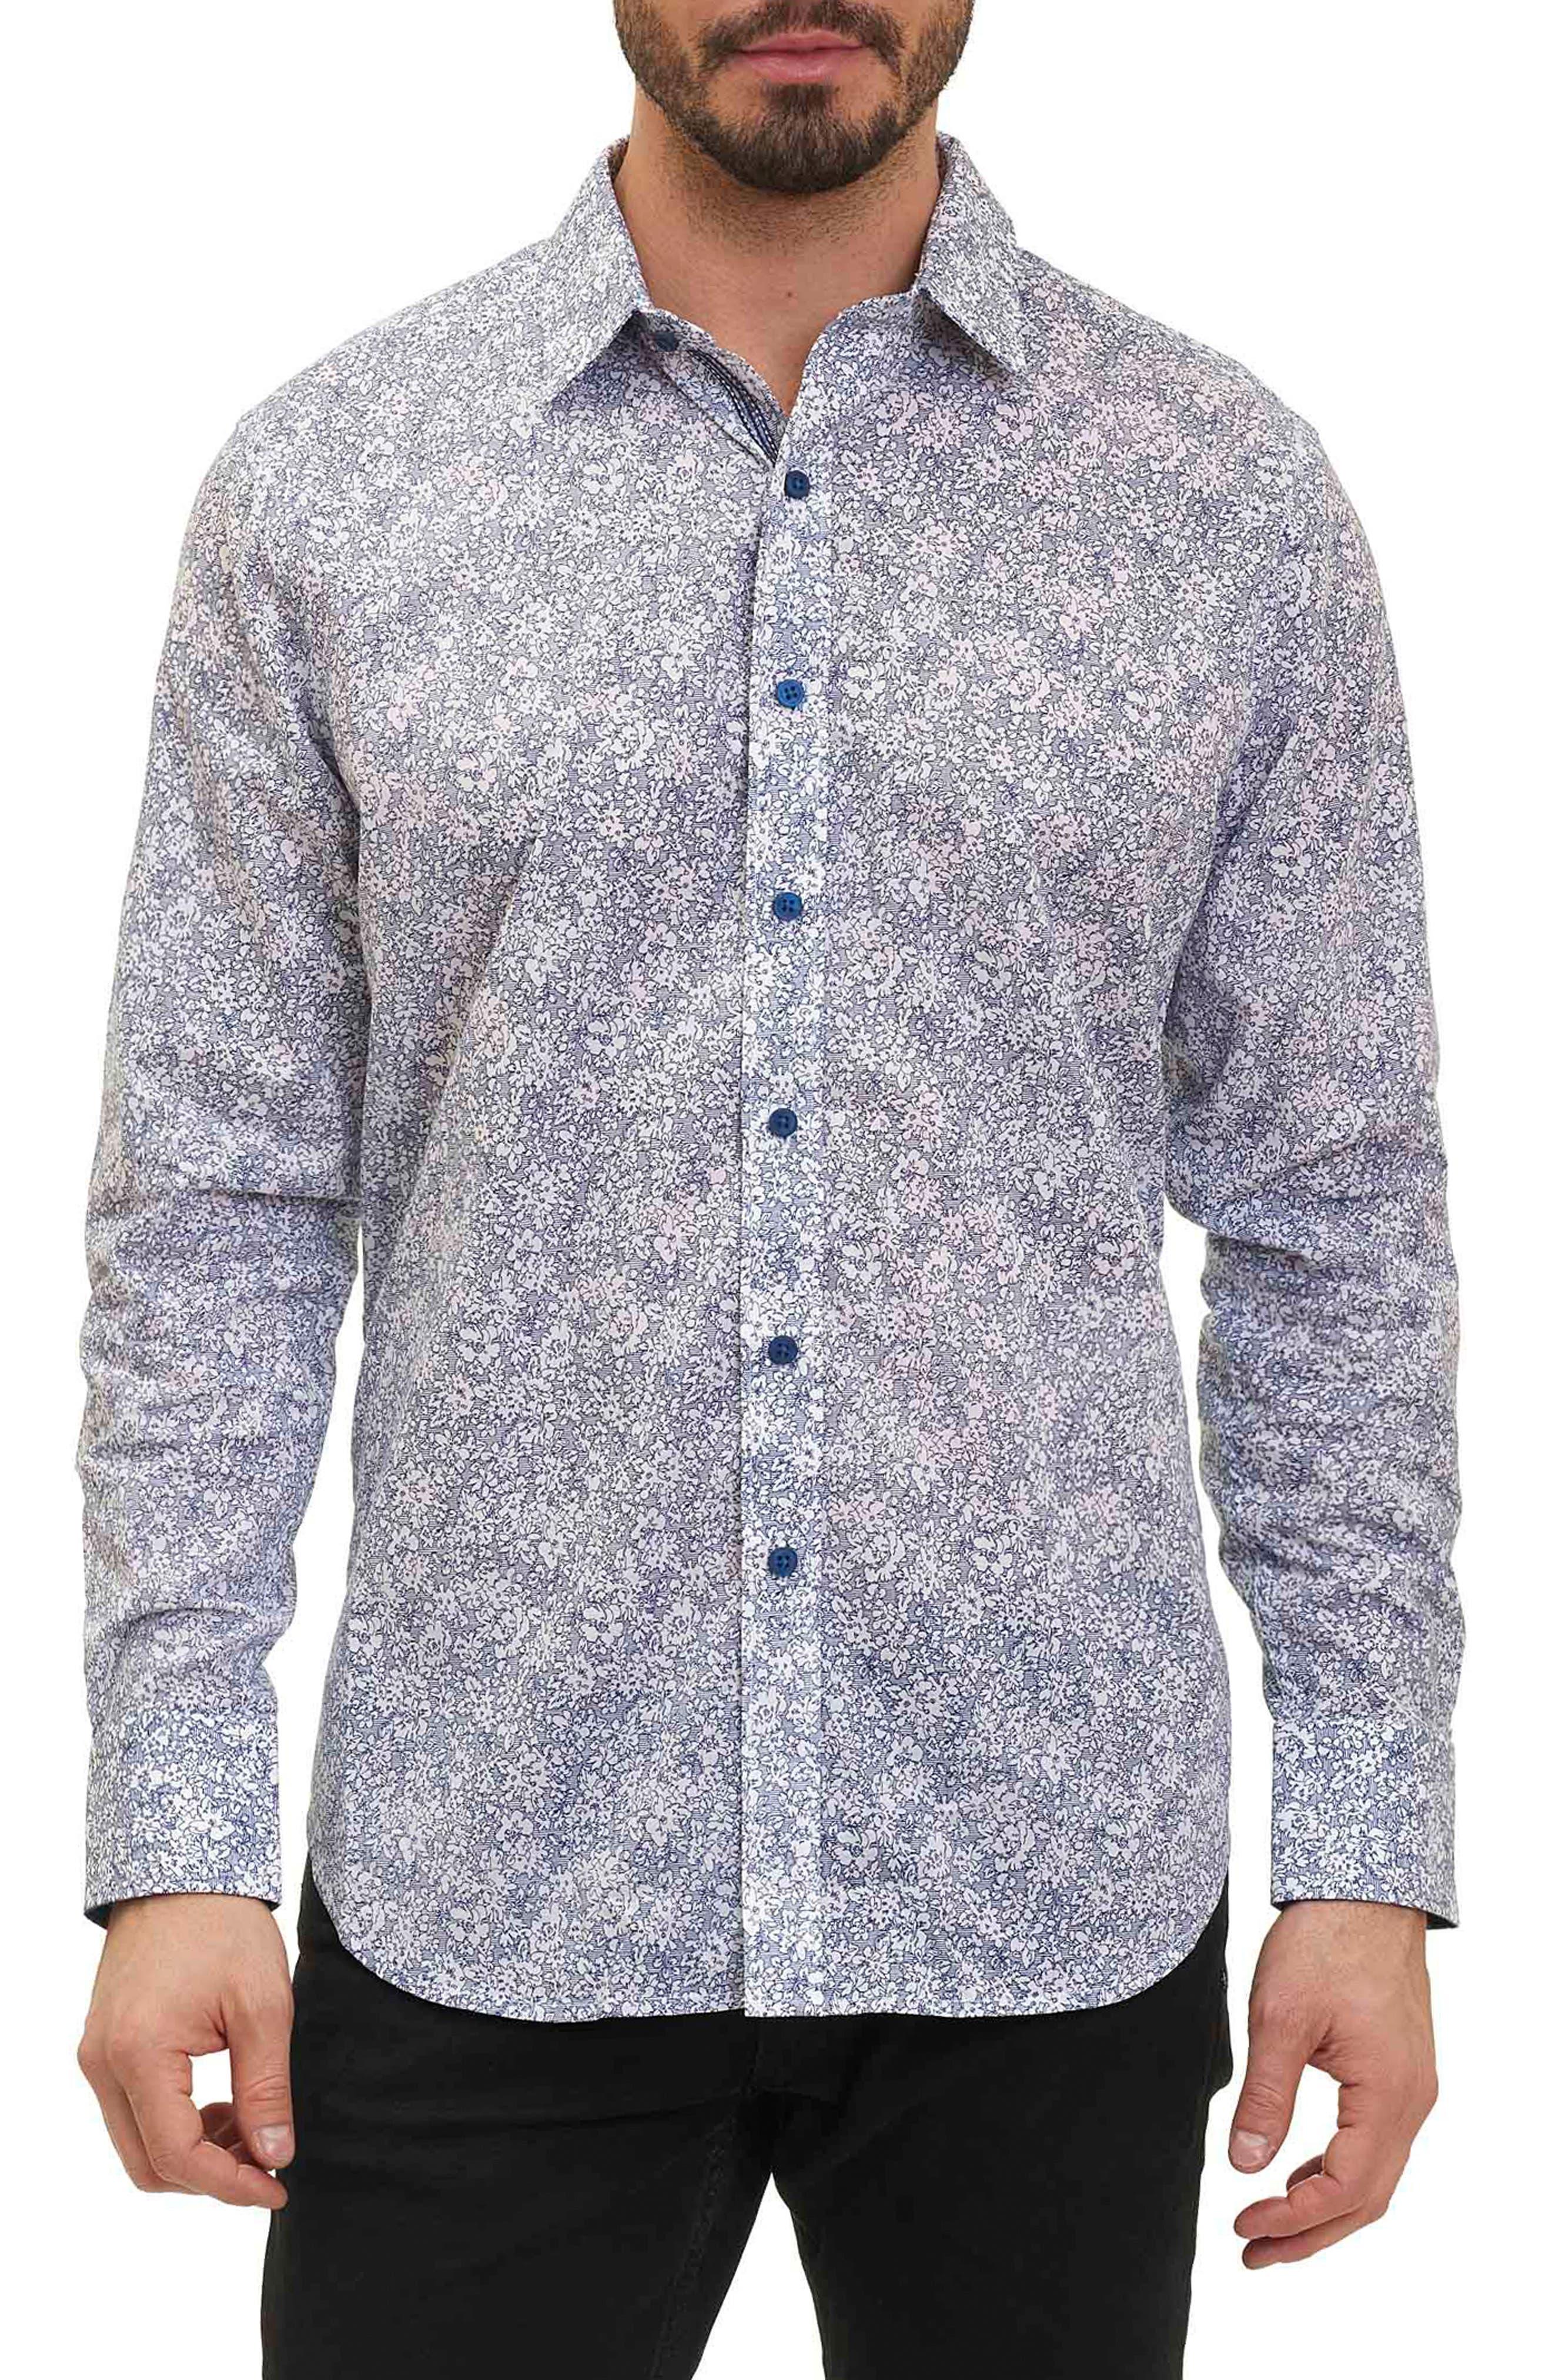 Alternate Image 1 Selected - Robert Graham Moss Landing Classic Fit Floral Print Sport Shirt